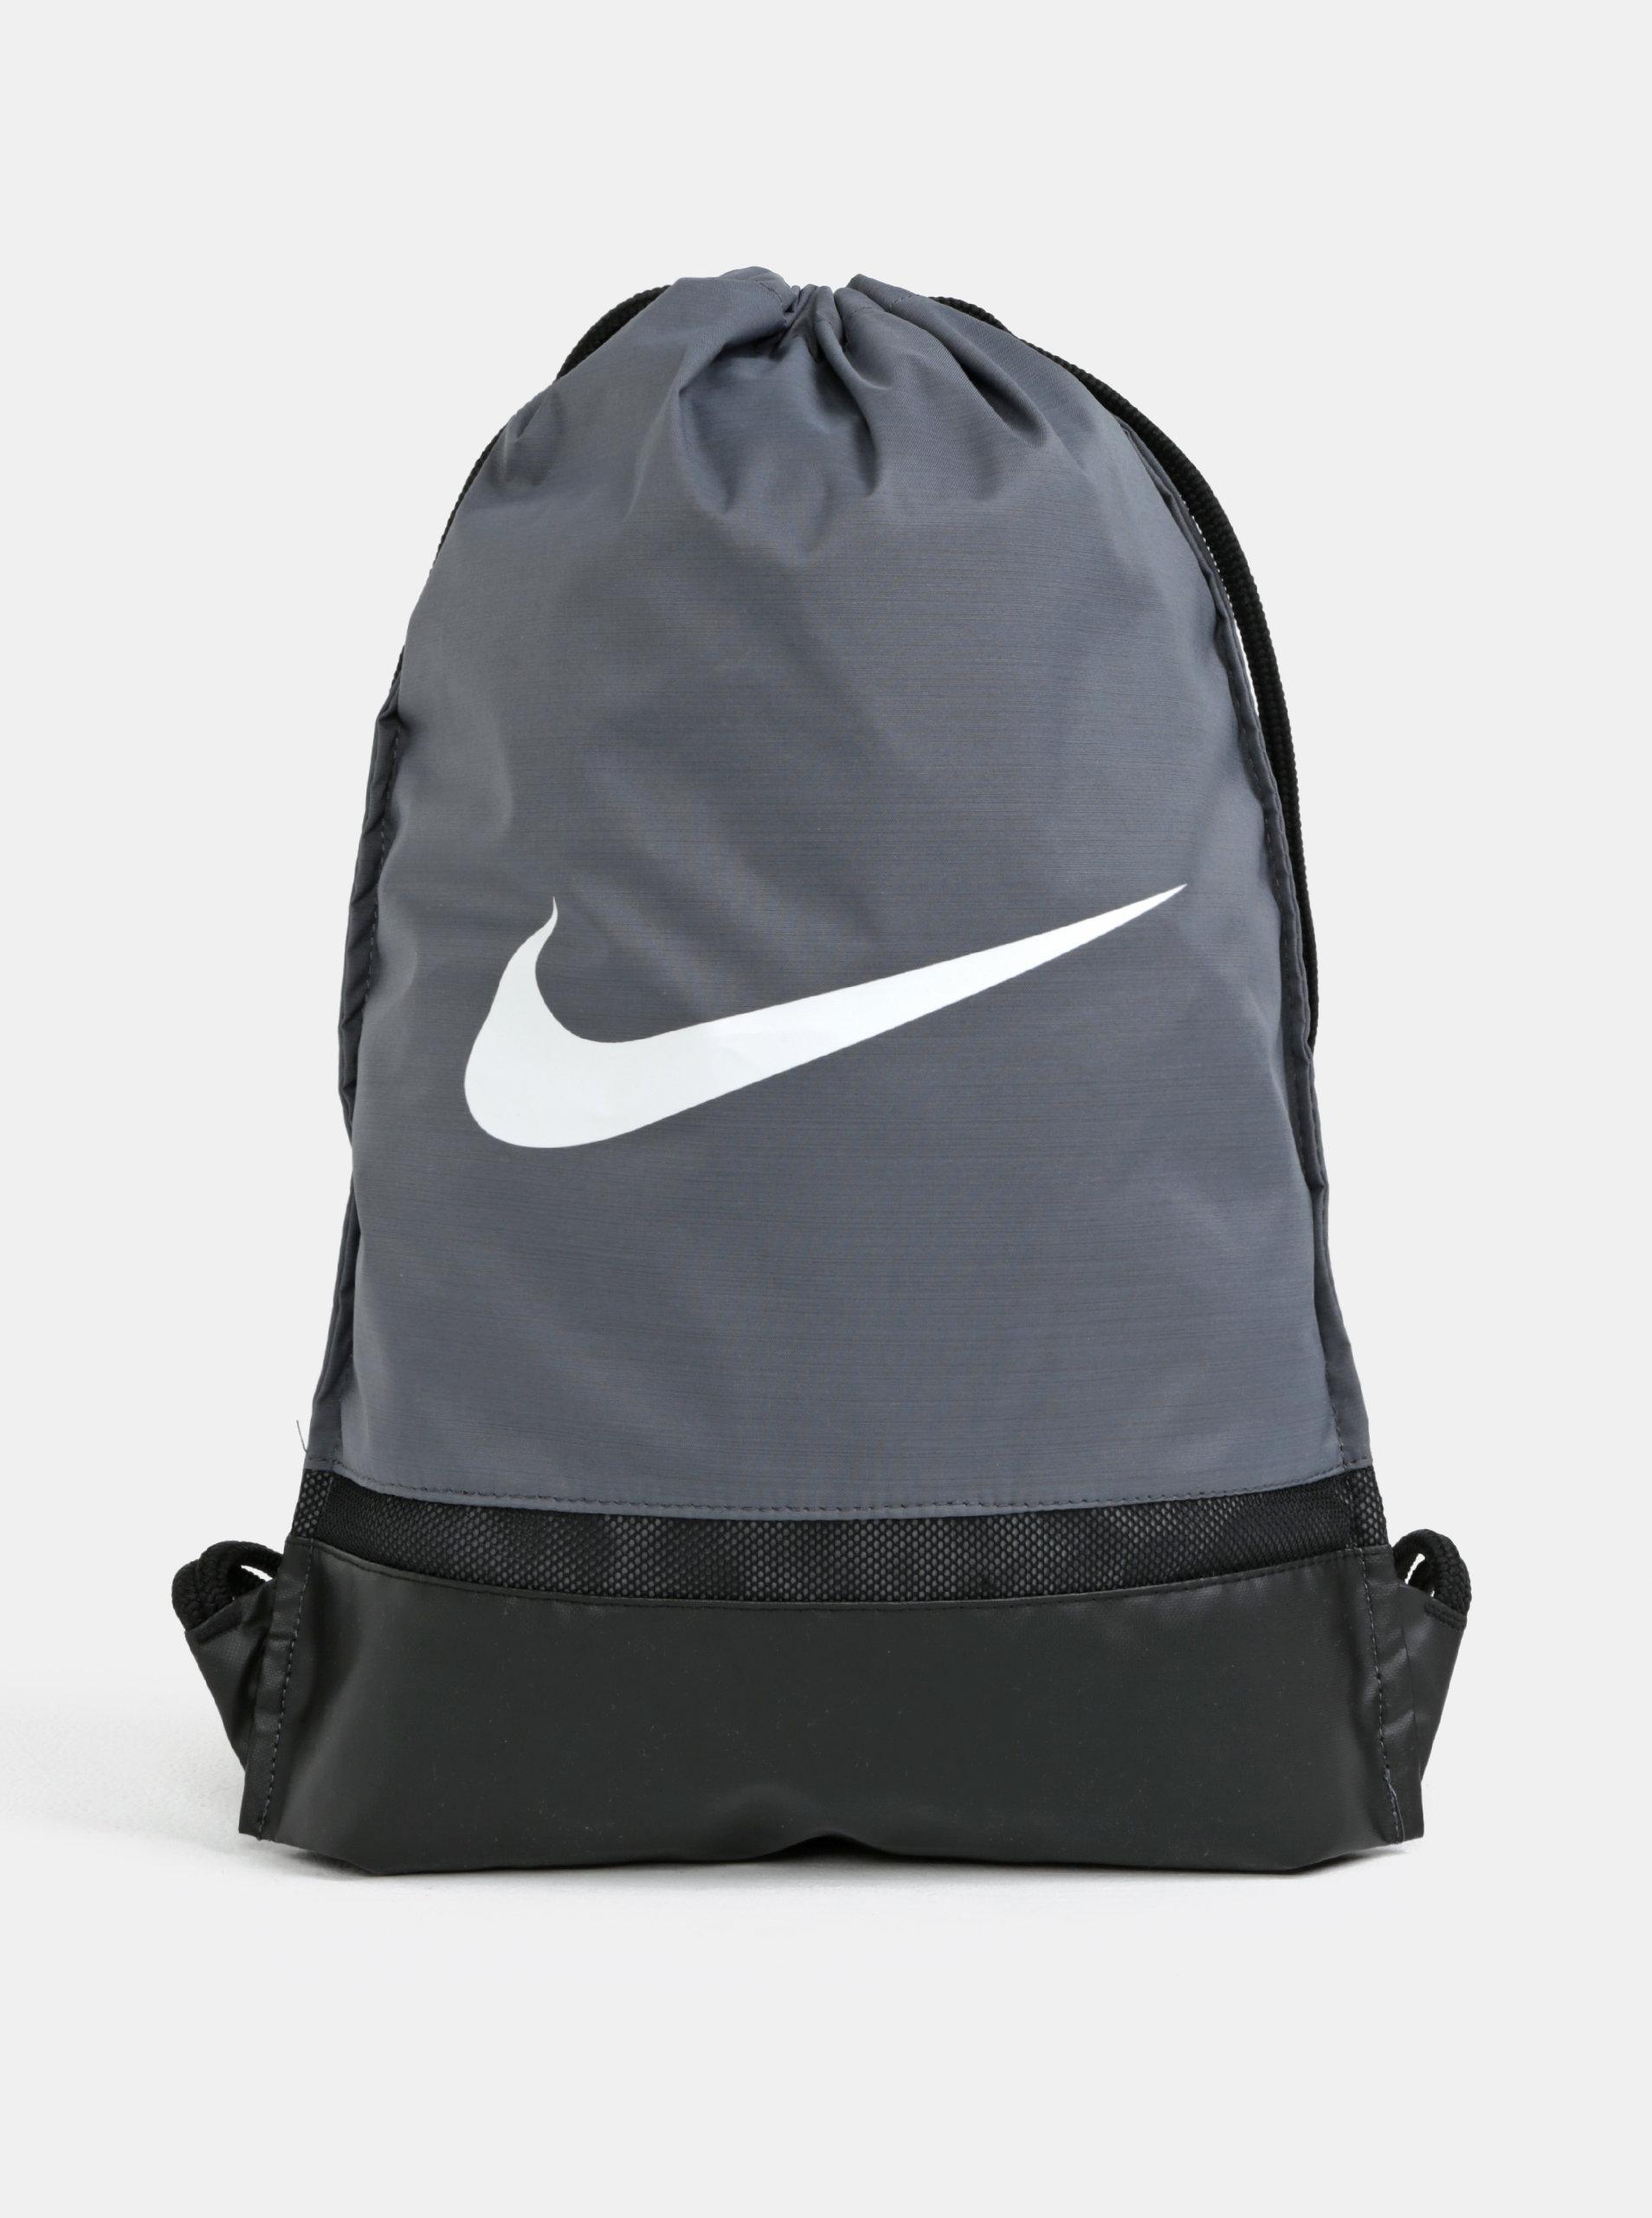 Šedý voděodolný vak Nike Brasilia